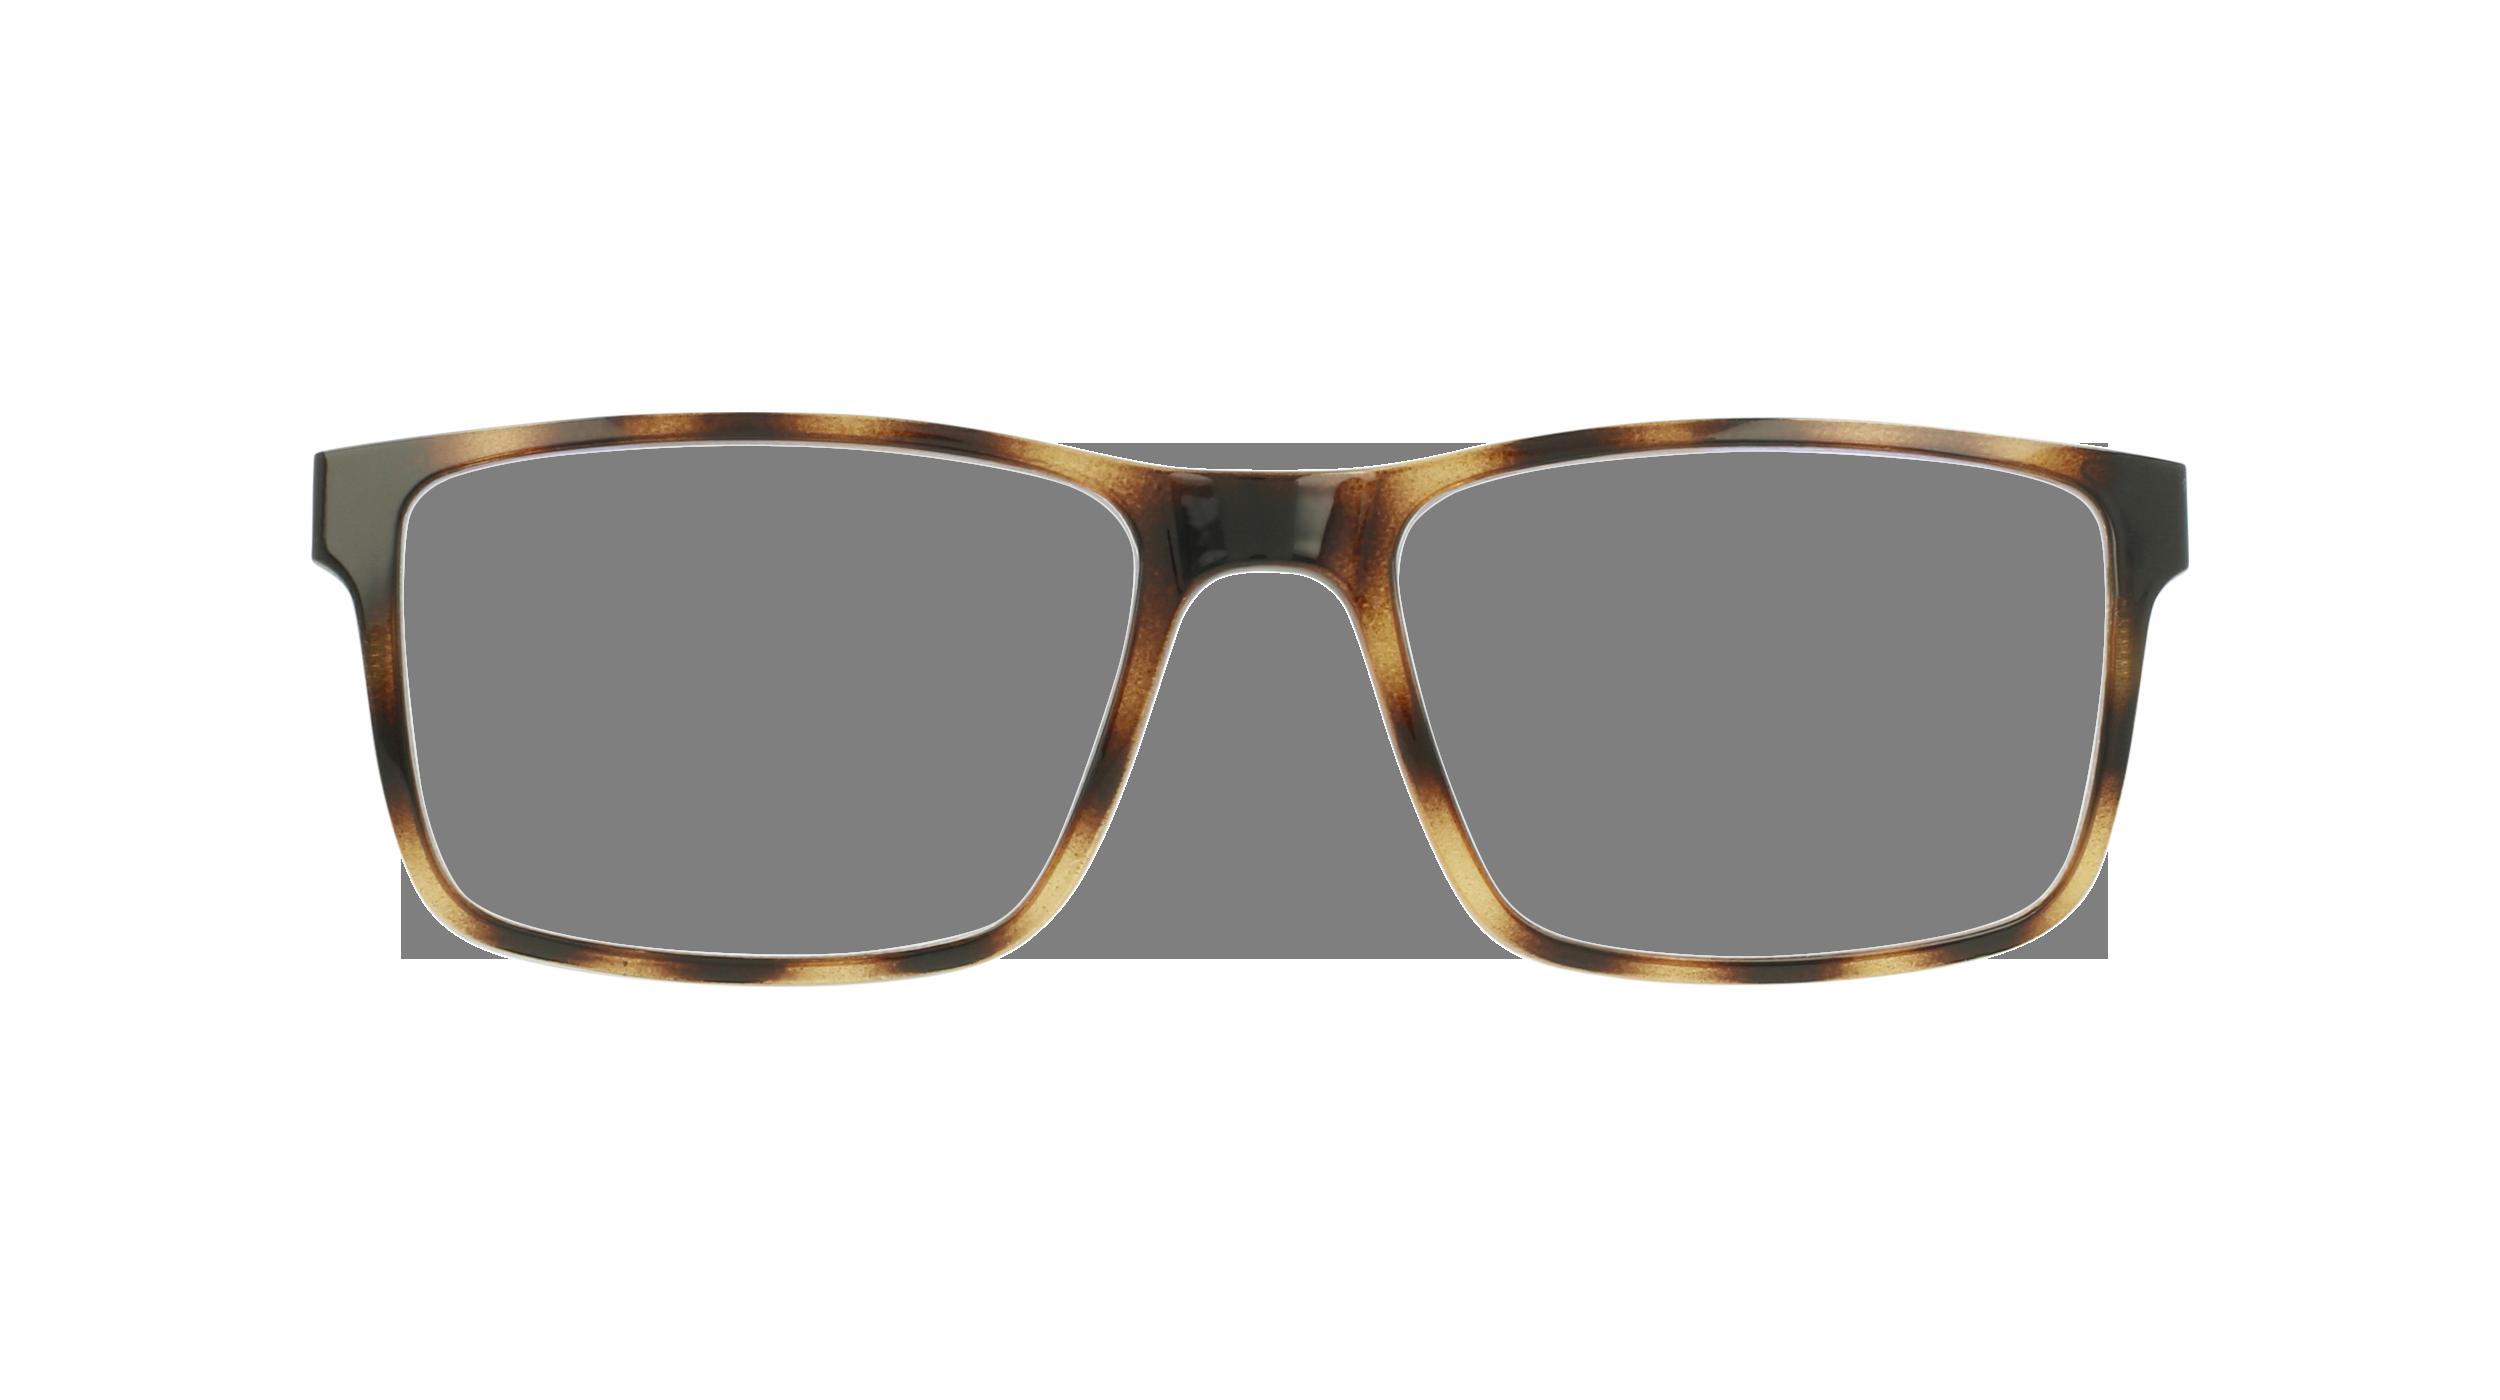 afflelou/france/products/smart_clip/clips_glasses/07630036457474.png